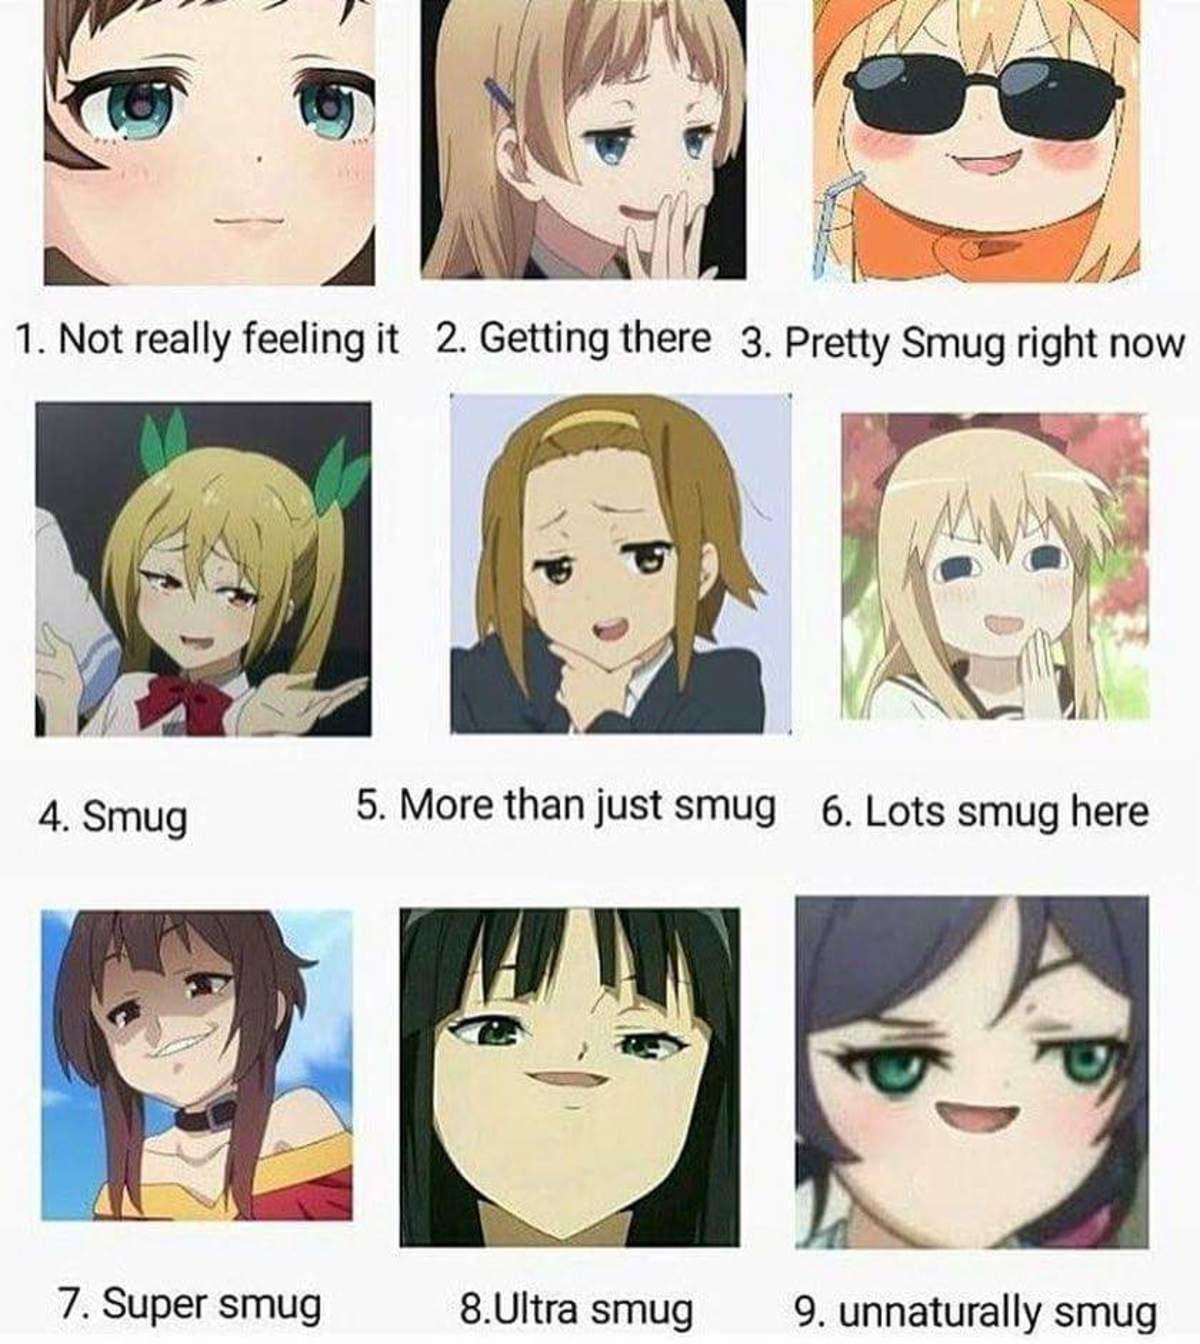 "How Ya Feeling FJ?. . 7. Super smug smug 9. unnaturally smug. mousesama used ""roll 1, 1-9""mousesama rolls 4 Anime manga smug Face"